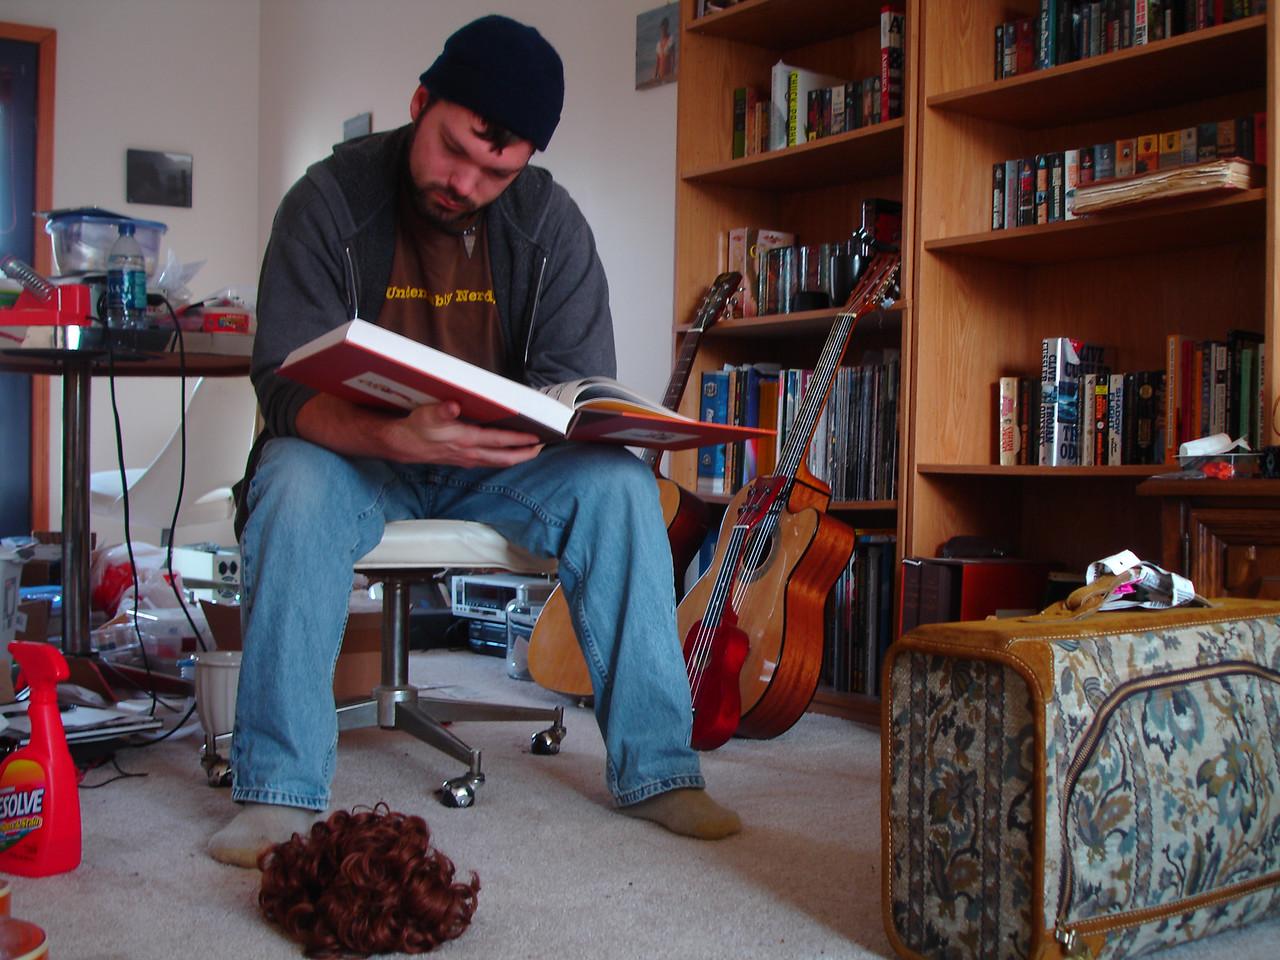 Steve studies up on his Calvin & Hobbes